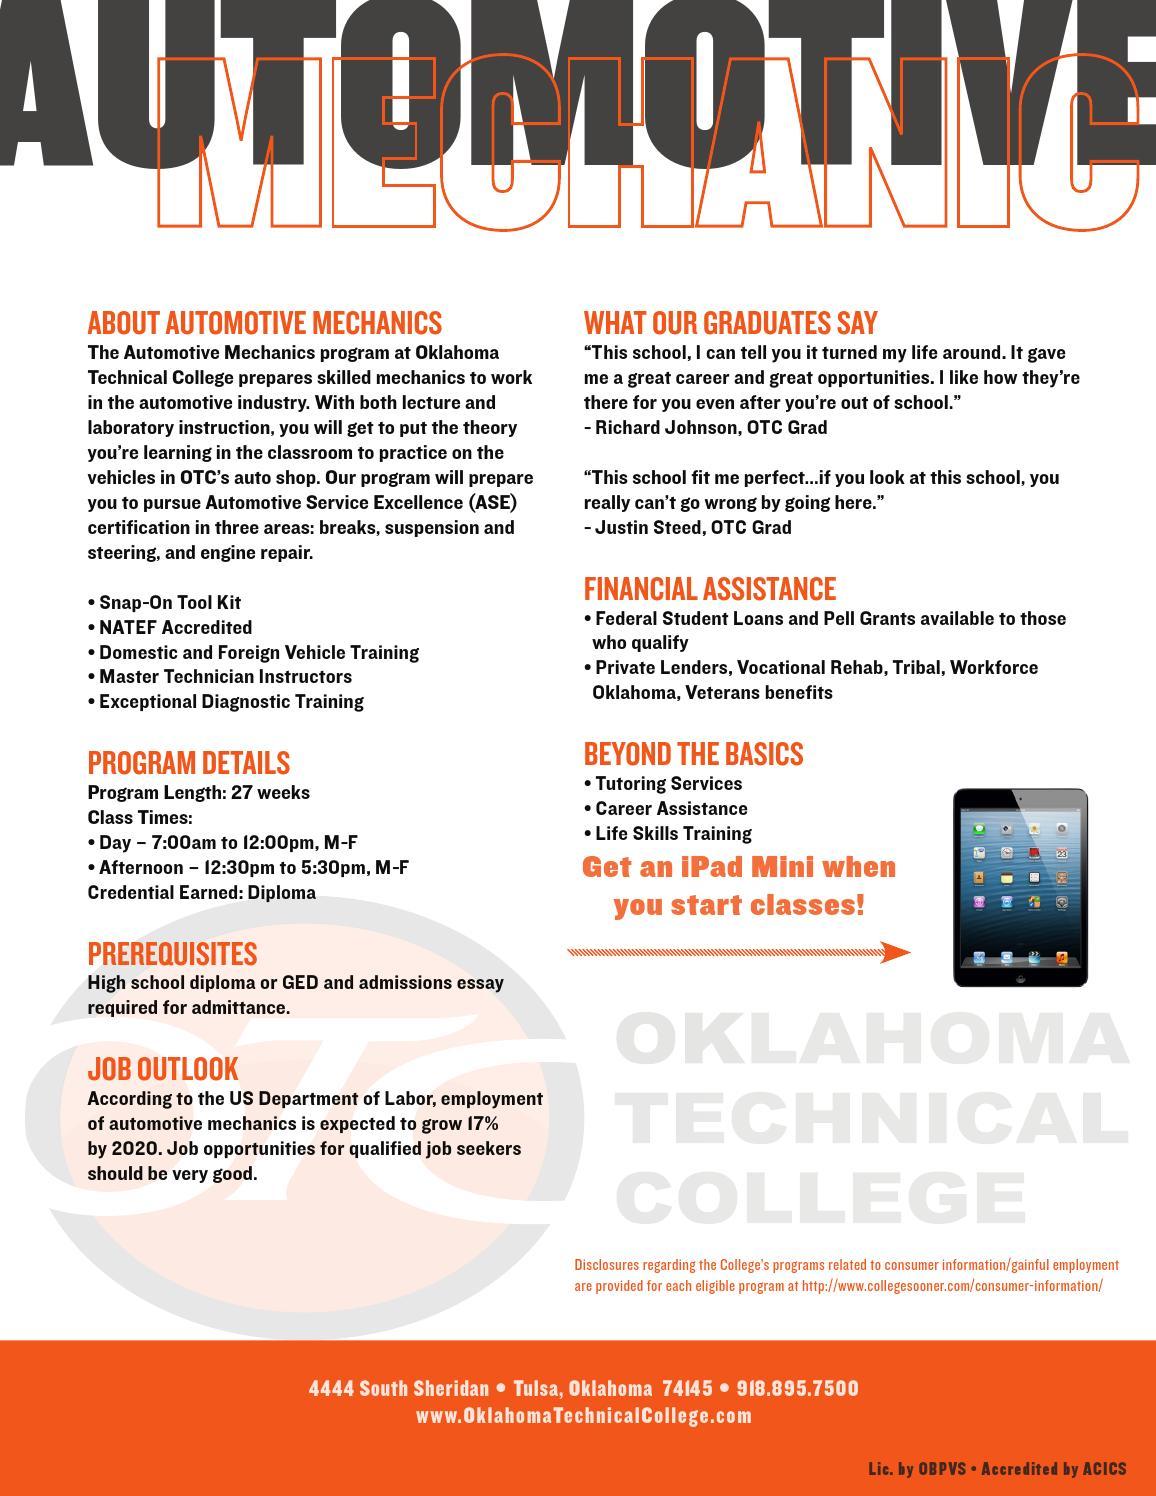 Otc Automotive Mechanic By Community Care College Clary Sage